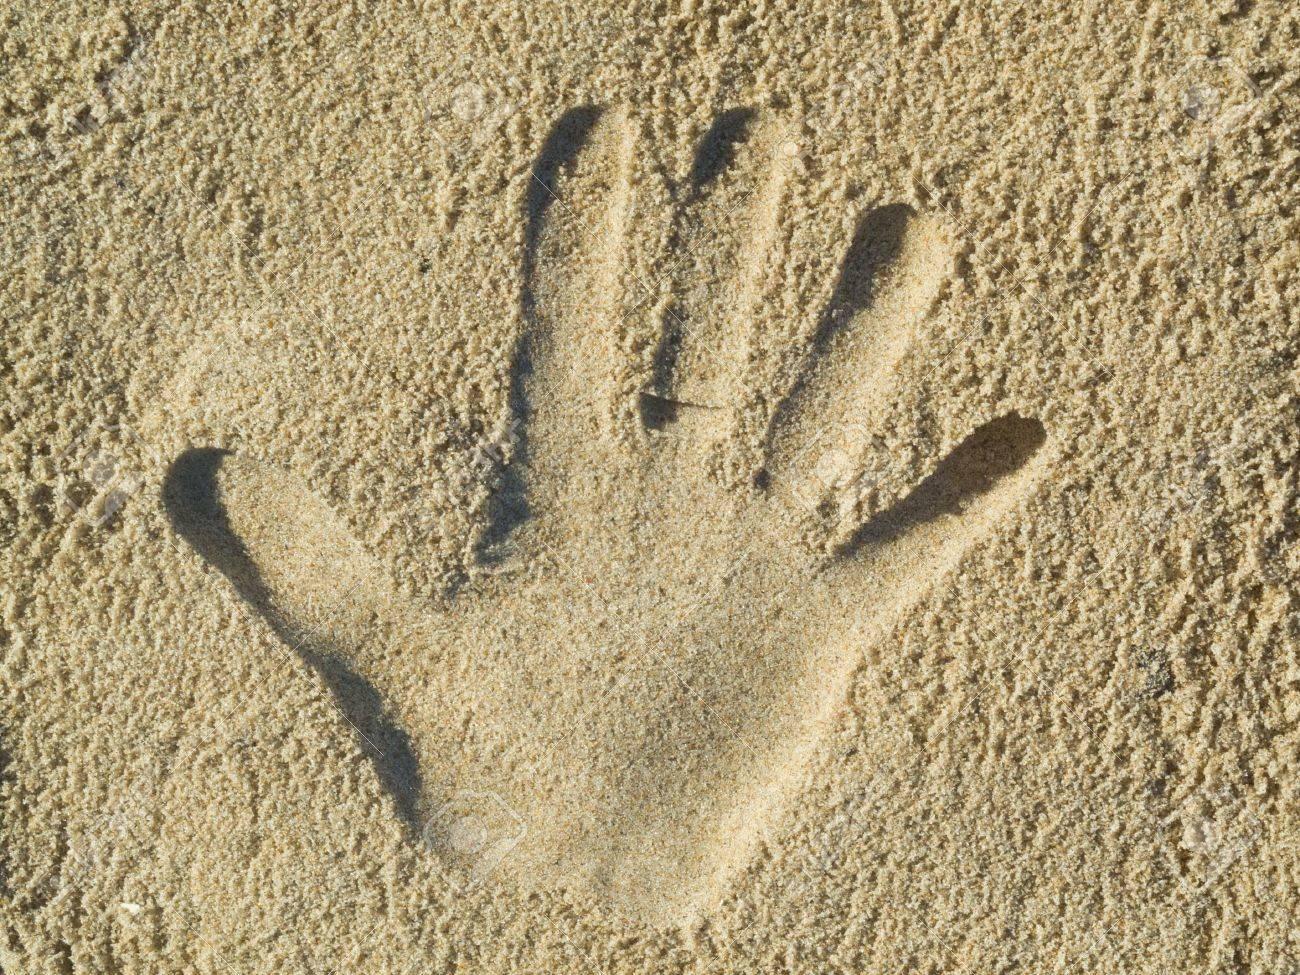 Optical illusion - Handprint in the sand Standard-Bild - 13284991